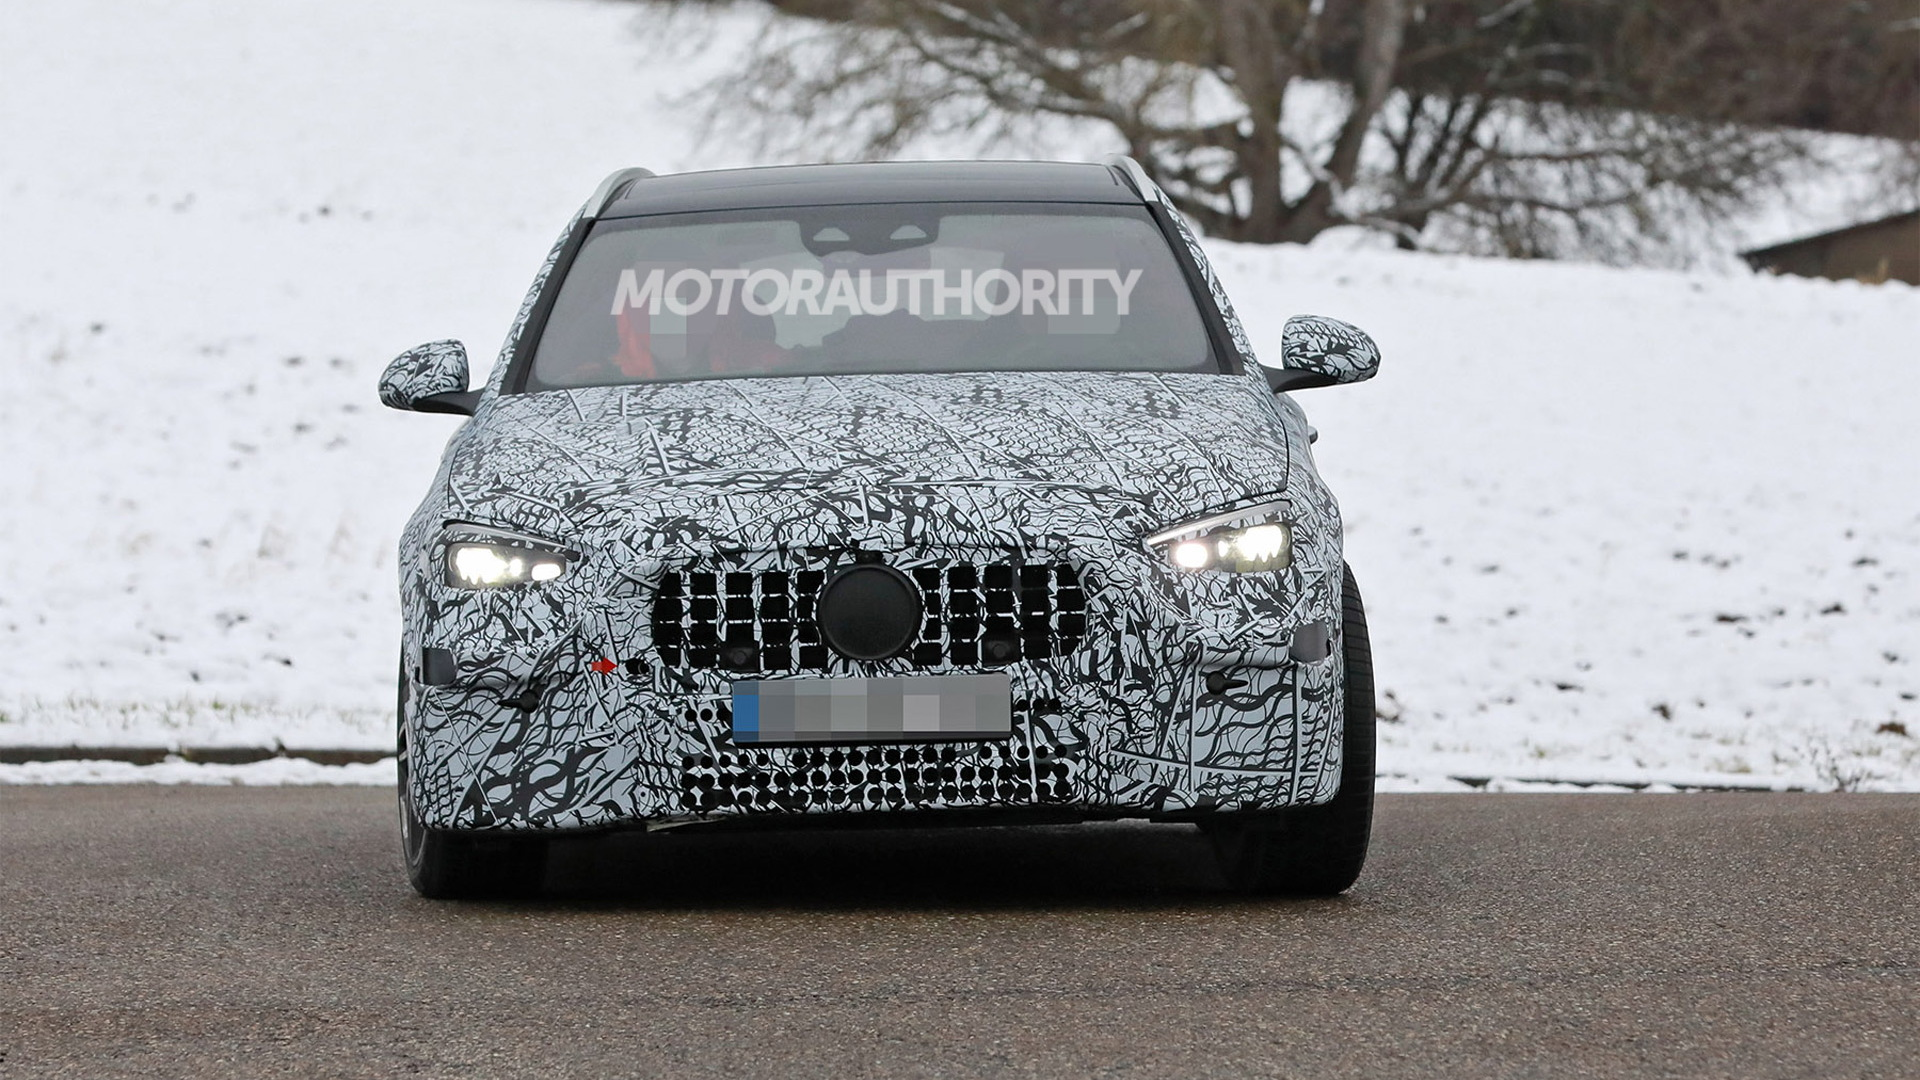 2022 Mercedes-Benz AMG C53 Wagon spy shots - Photo credit:S. Baldauf/SB-Medien